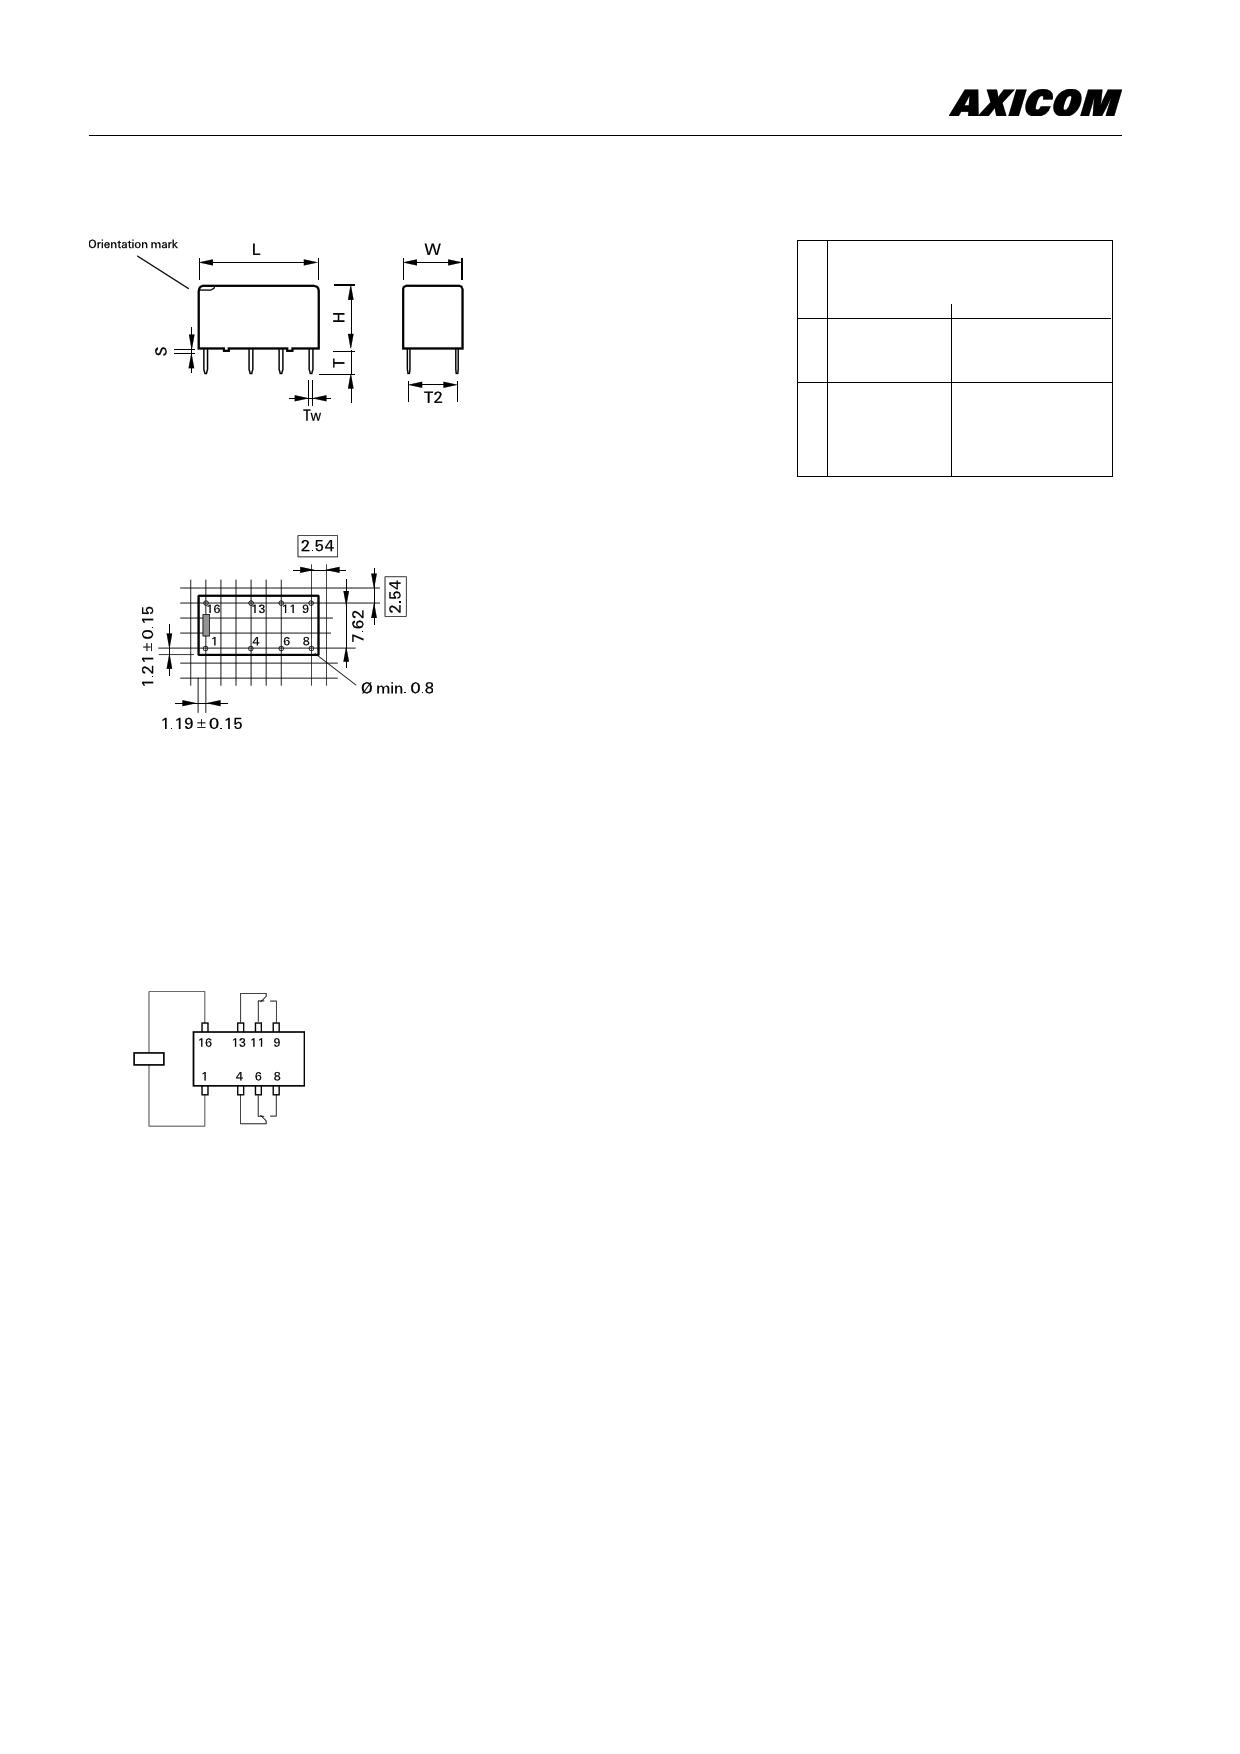 1-1462000-8 Даташит, Описание, Даташиты